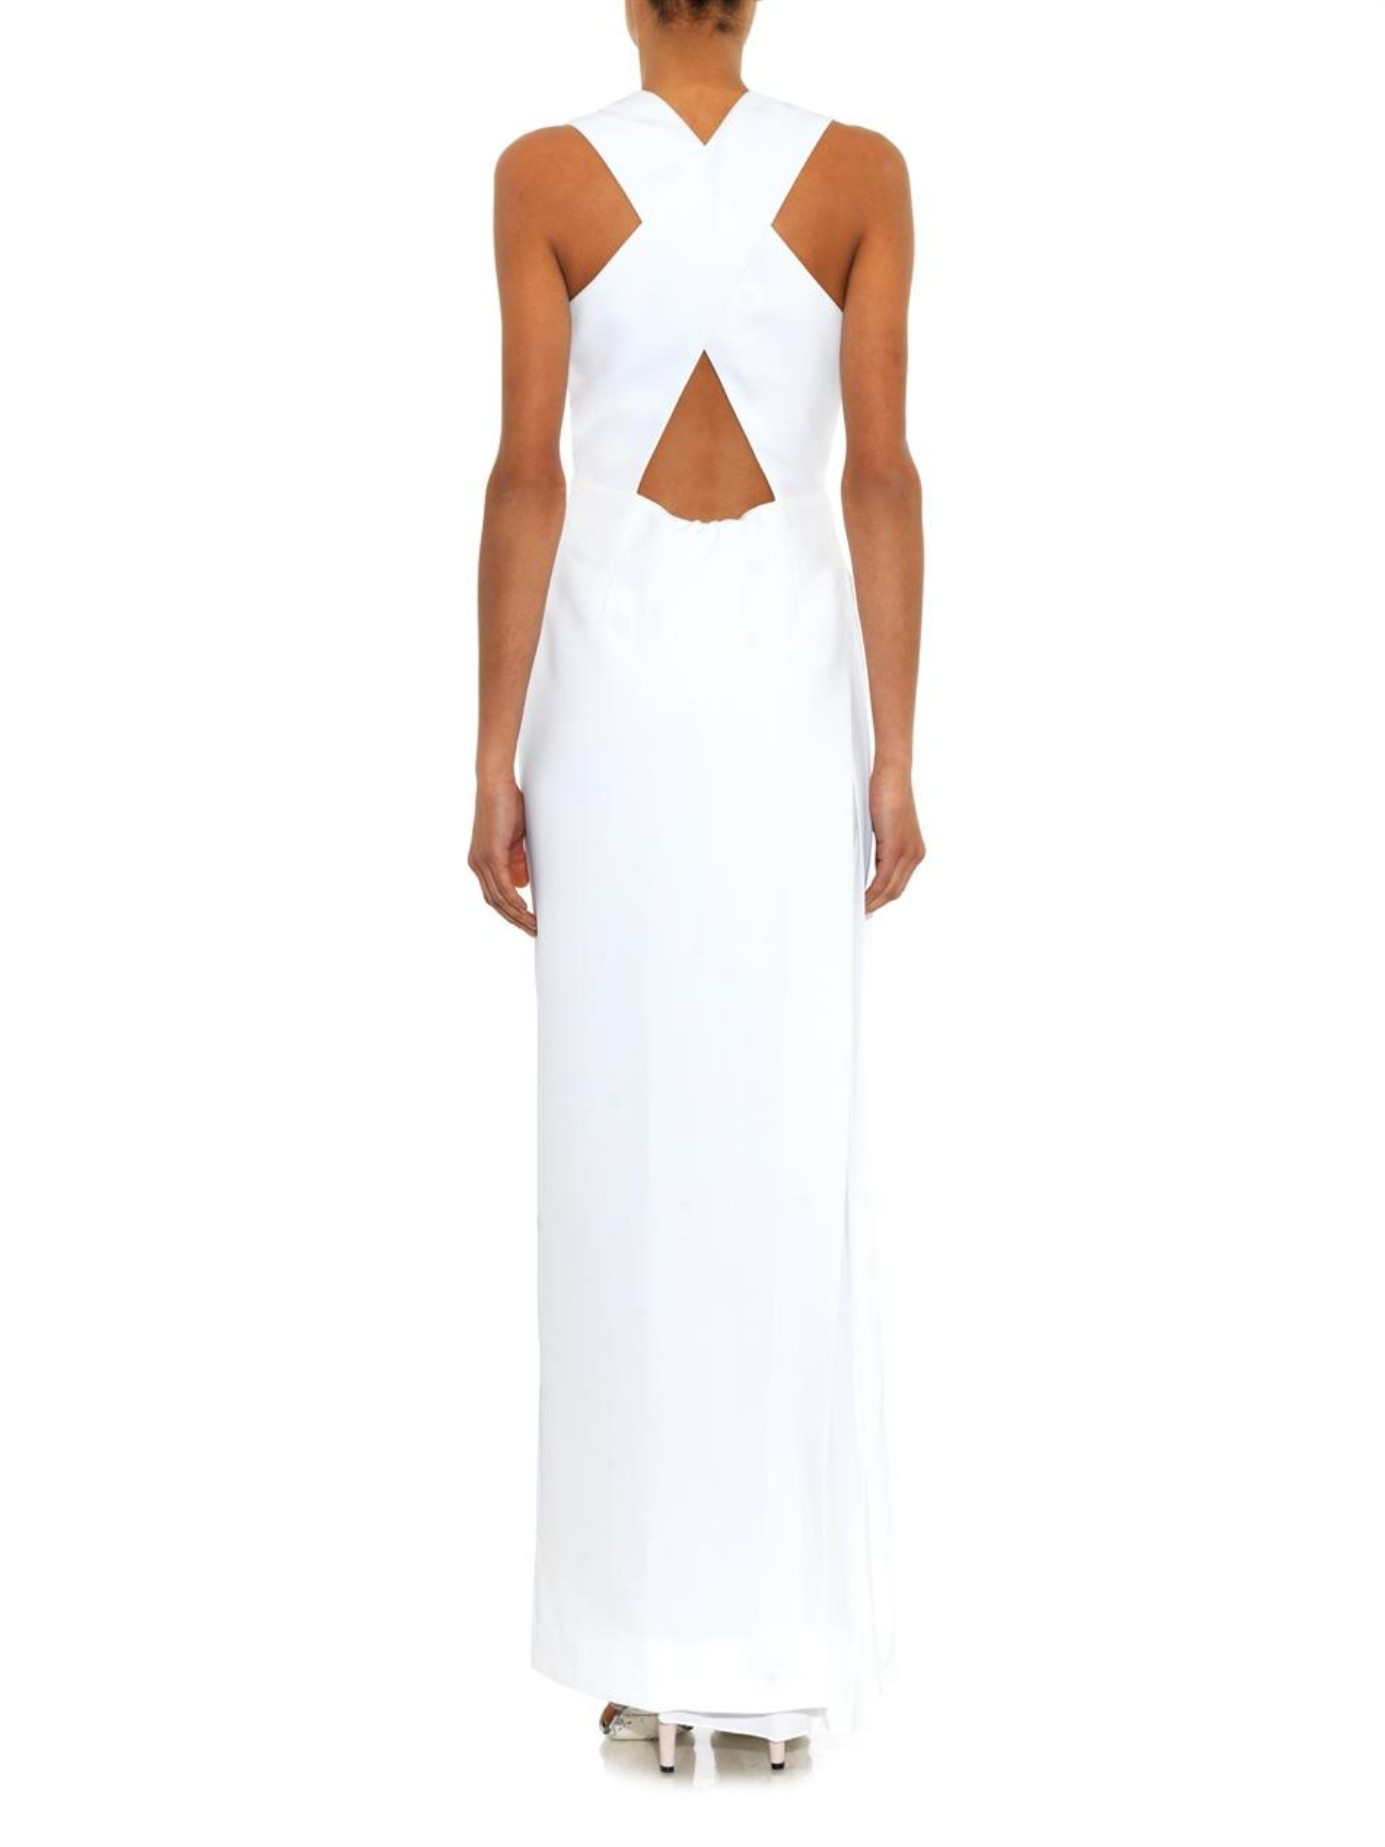 519391fcda251 Lyst - Camilla   Marc Gold-dipper V-neck Gown in White